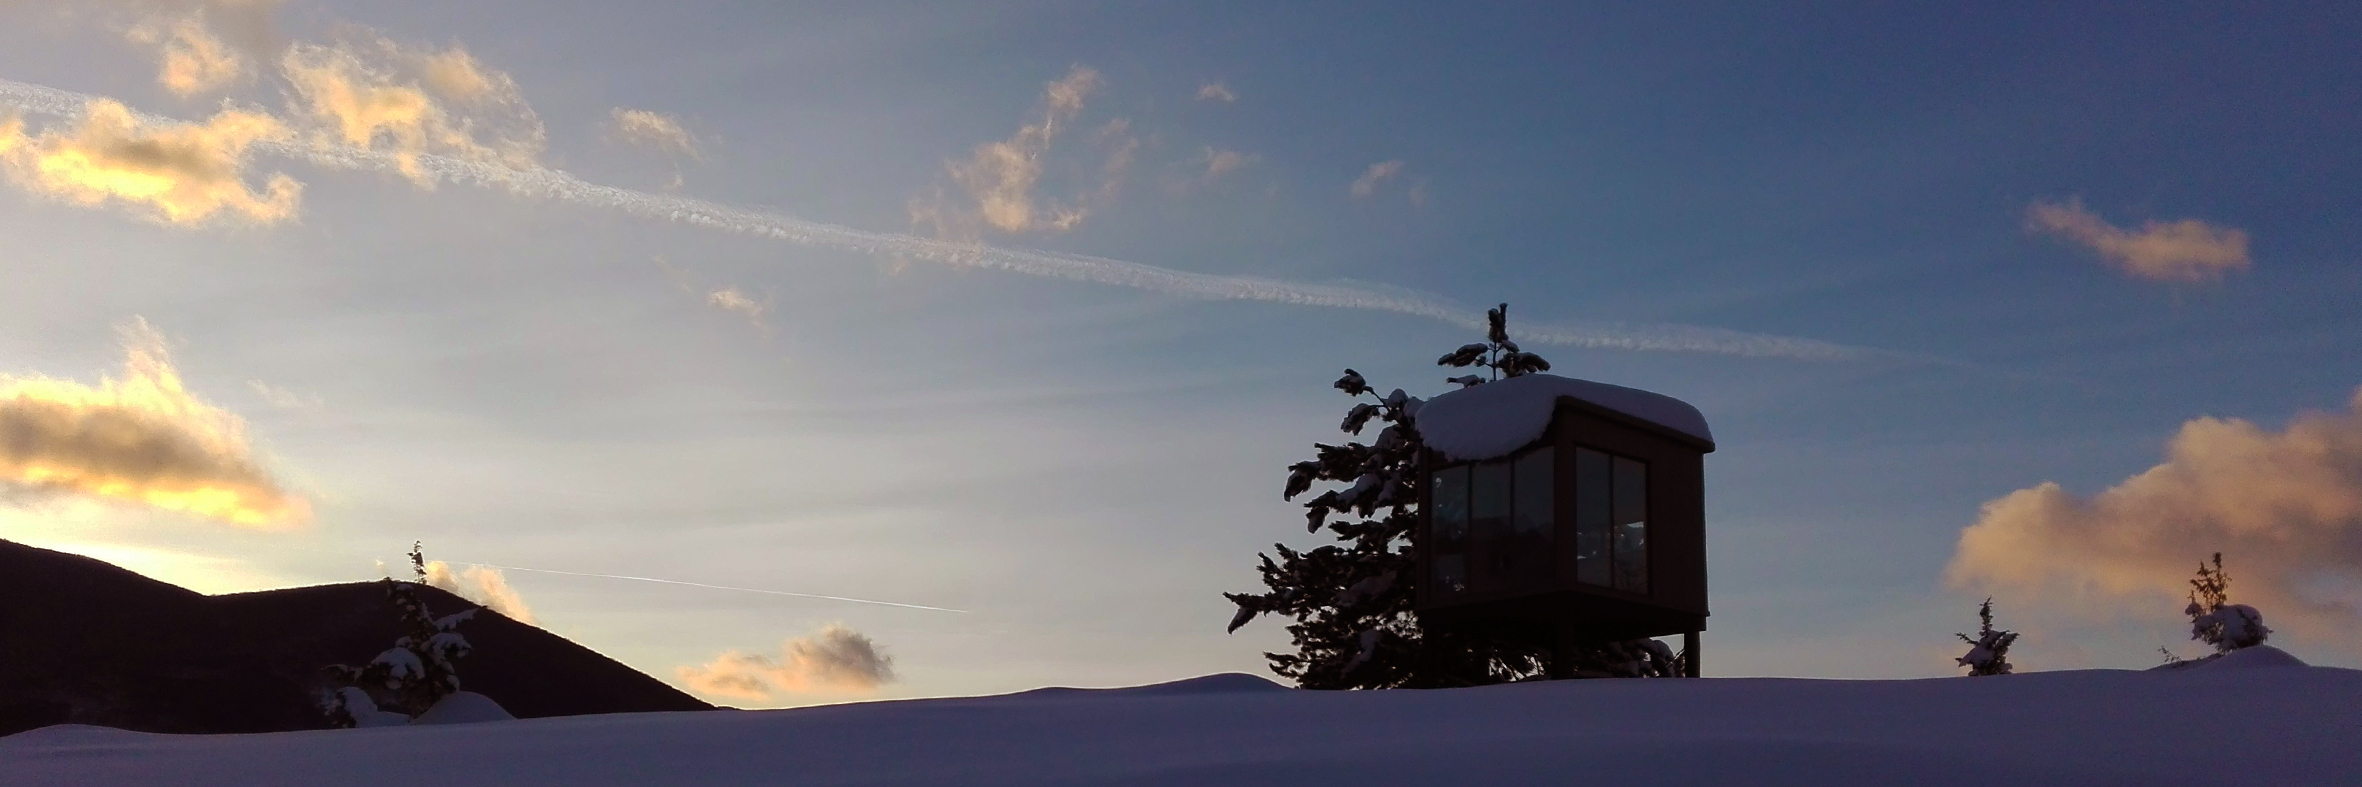 neve al PineCube durante ciaspolata al tramonto